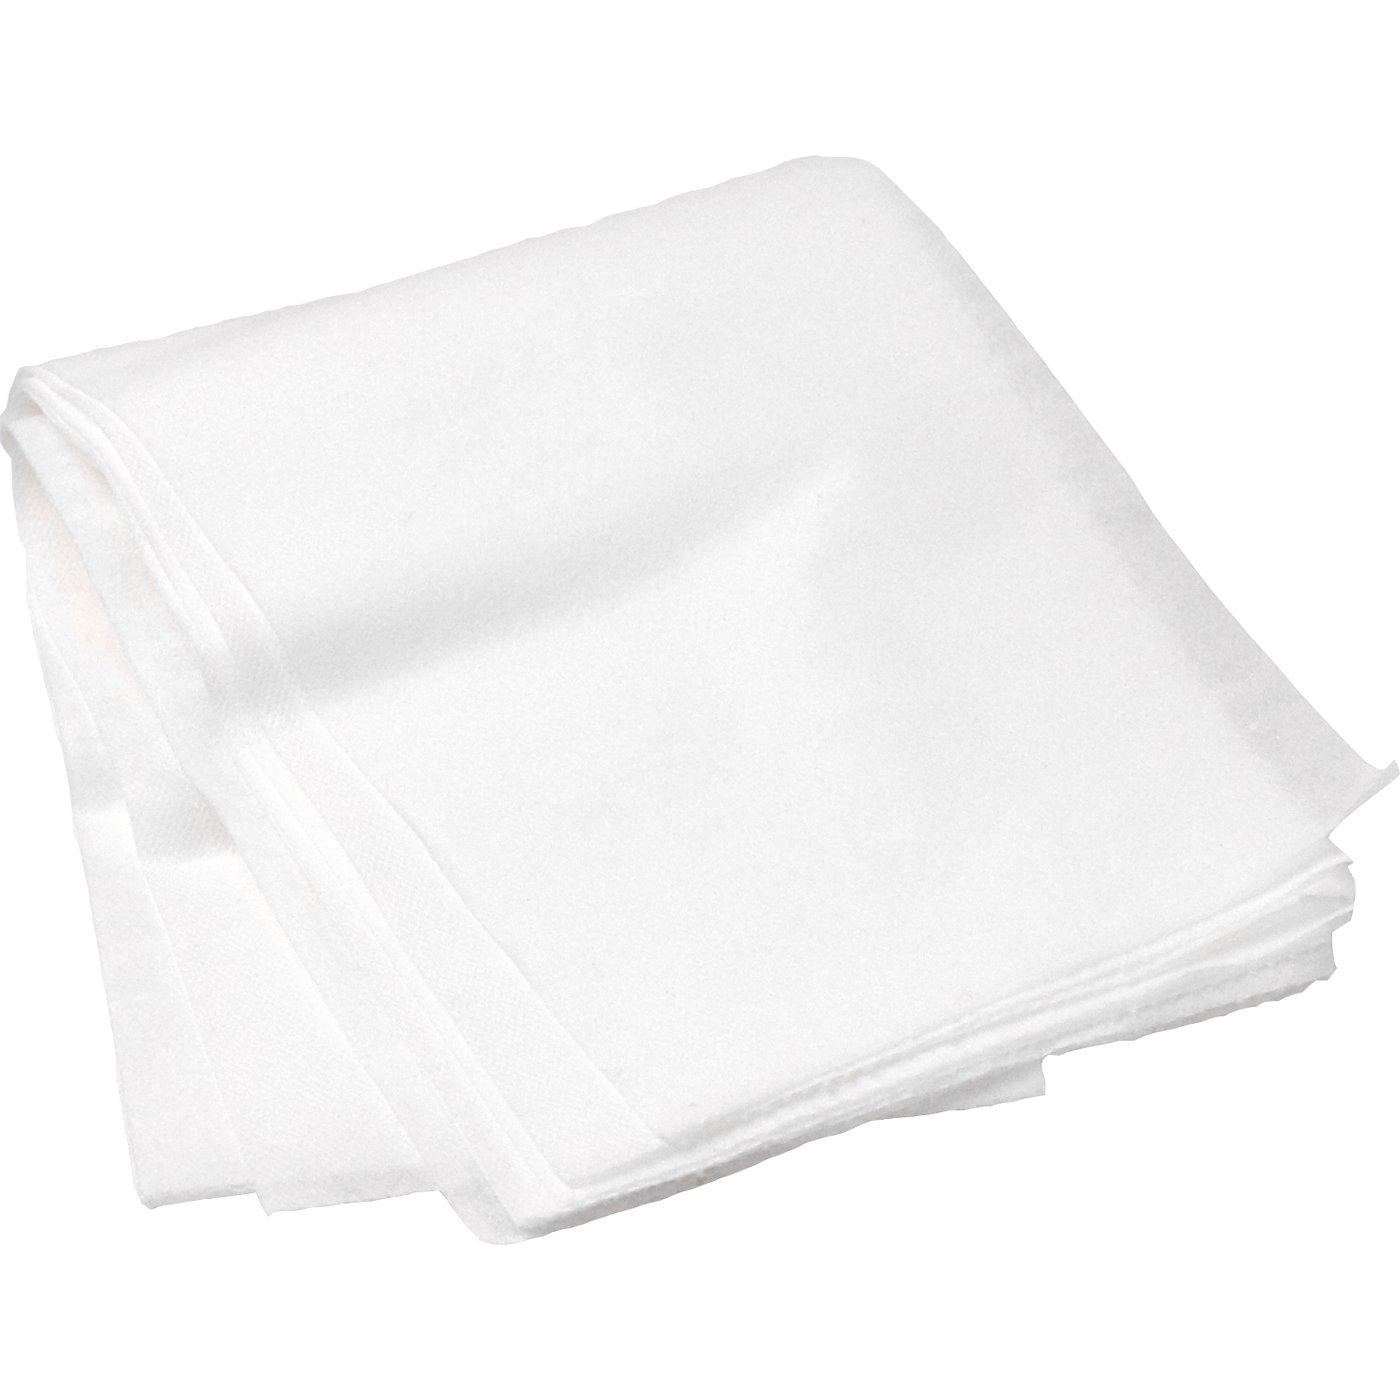 Kushies Flushable Biodegradable Diaper Liners, 100 Sheets L545